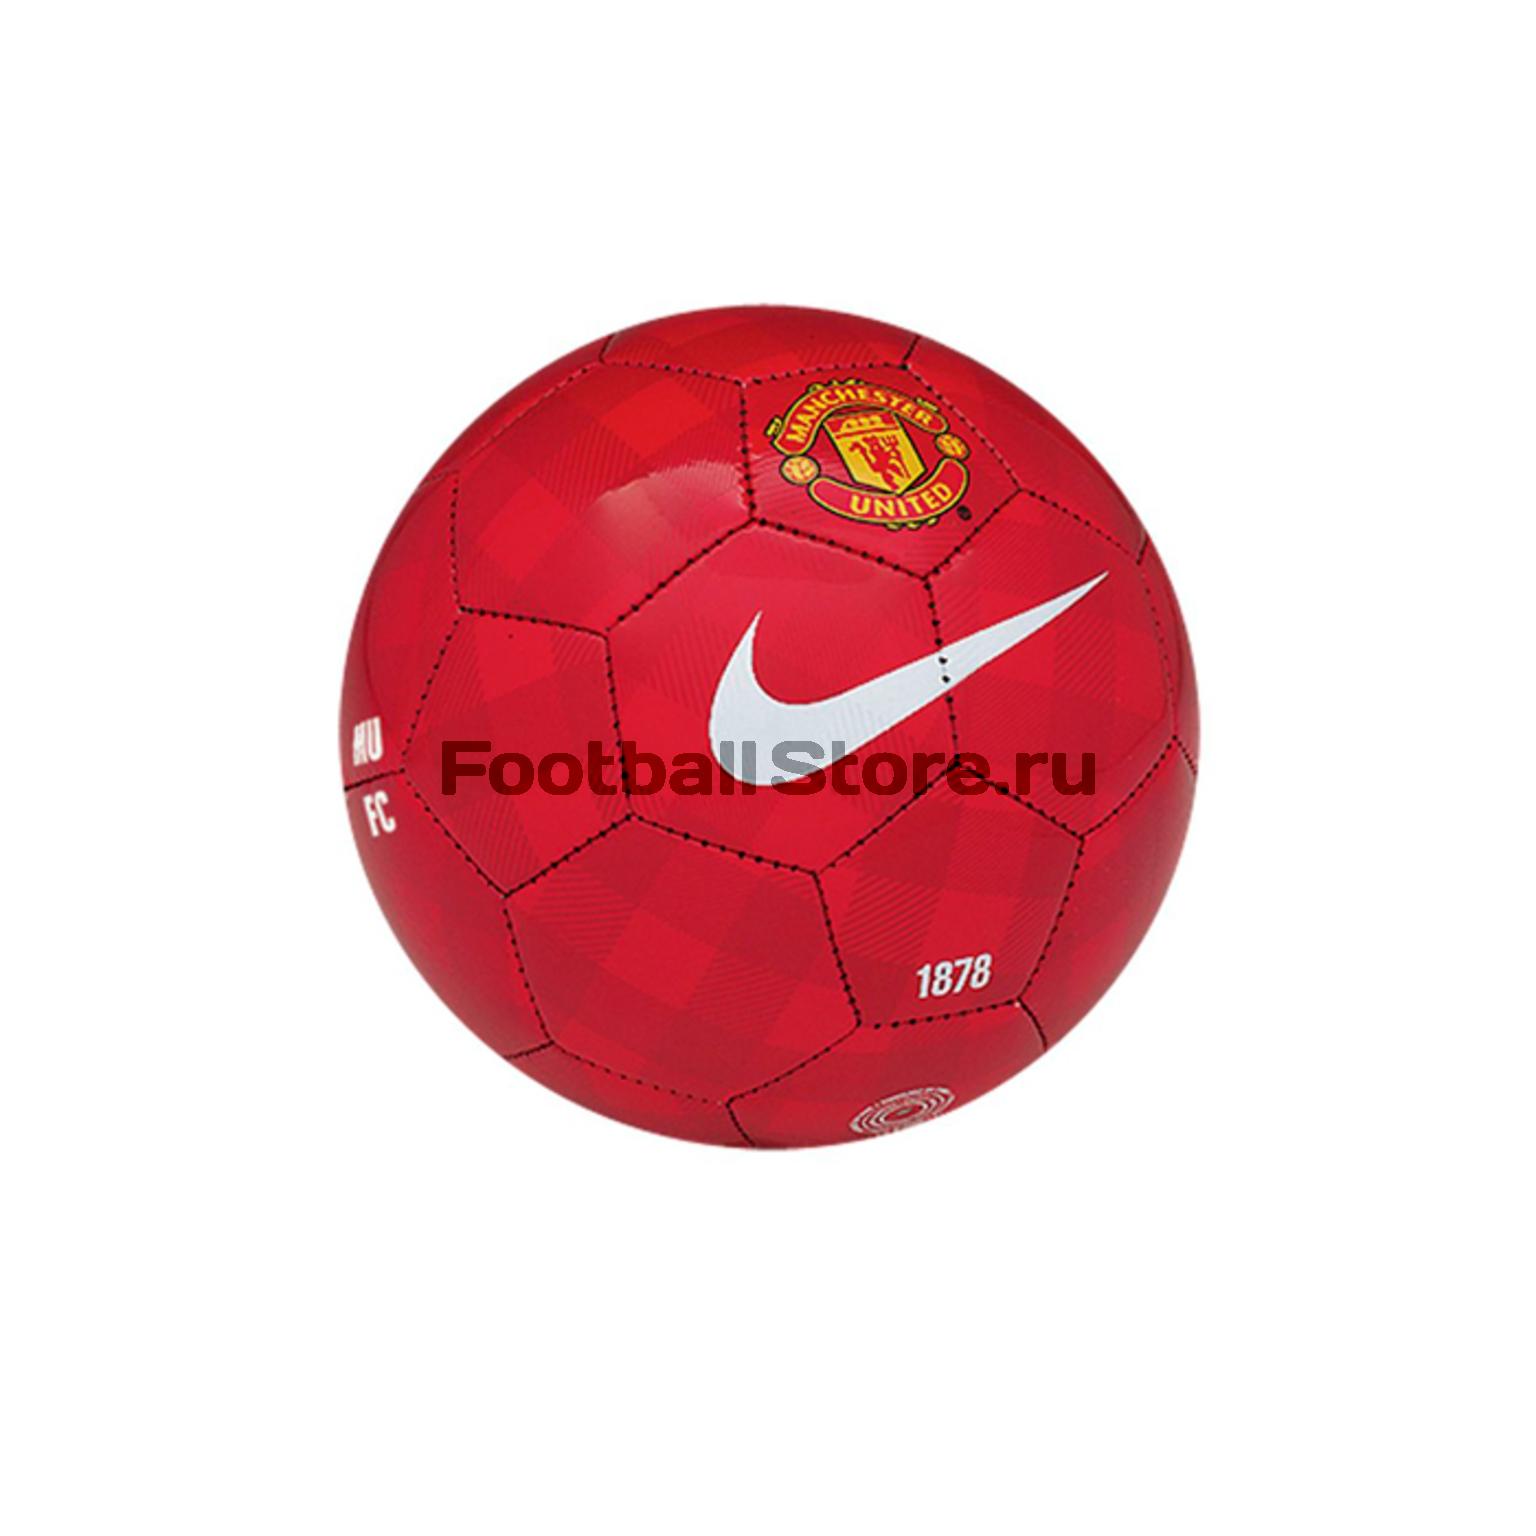 Сувенирные Nike Мяч сувенирный Nike Man Utd skills